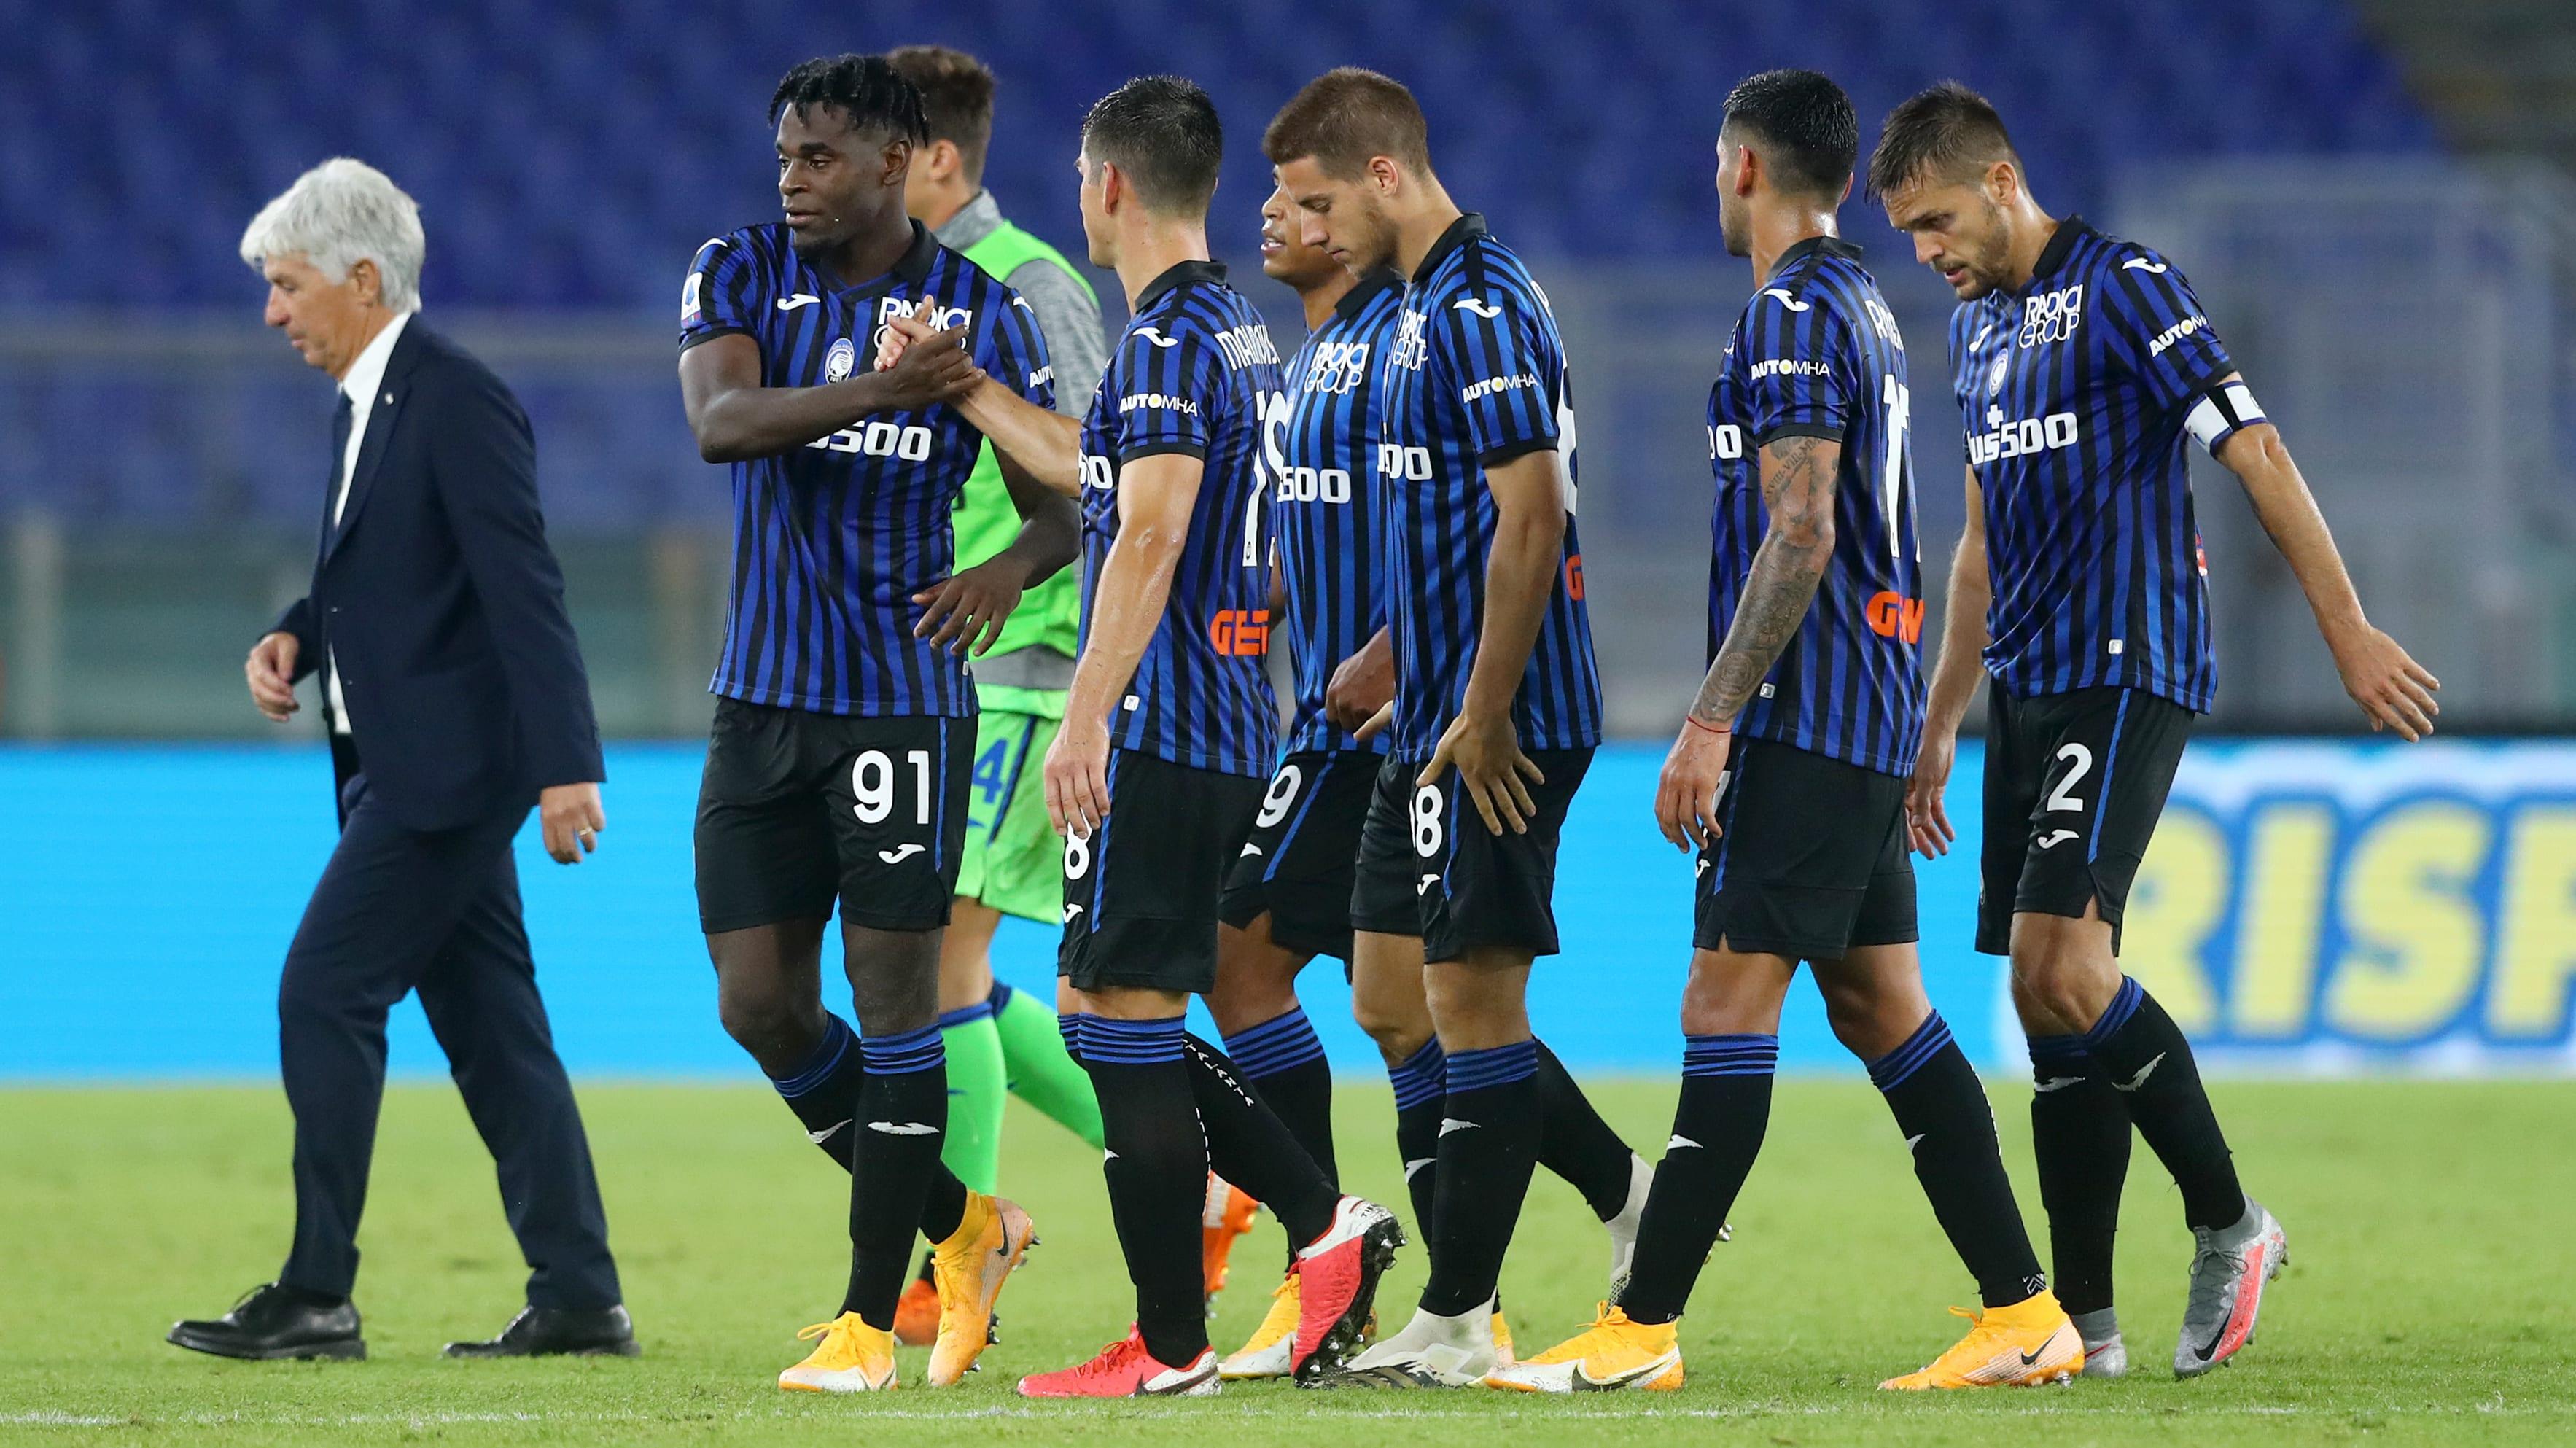 https://images2.minutemediacdn.com/image/upload/shape/cover/sport/SS-Lazio-v-Atalanta-BC---Serie-A-c4ebe1bc9cc7170489a11bd0017002d9.jpg